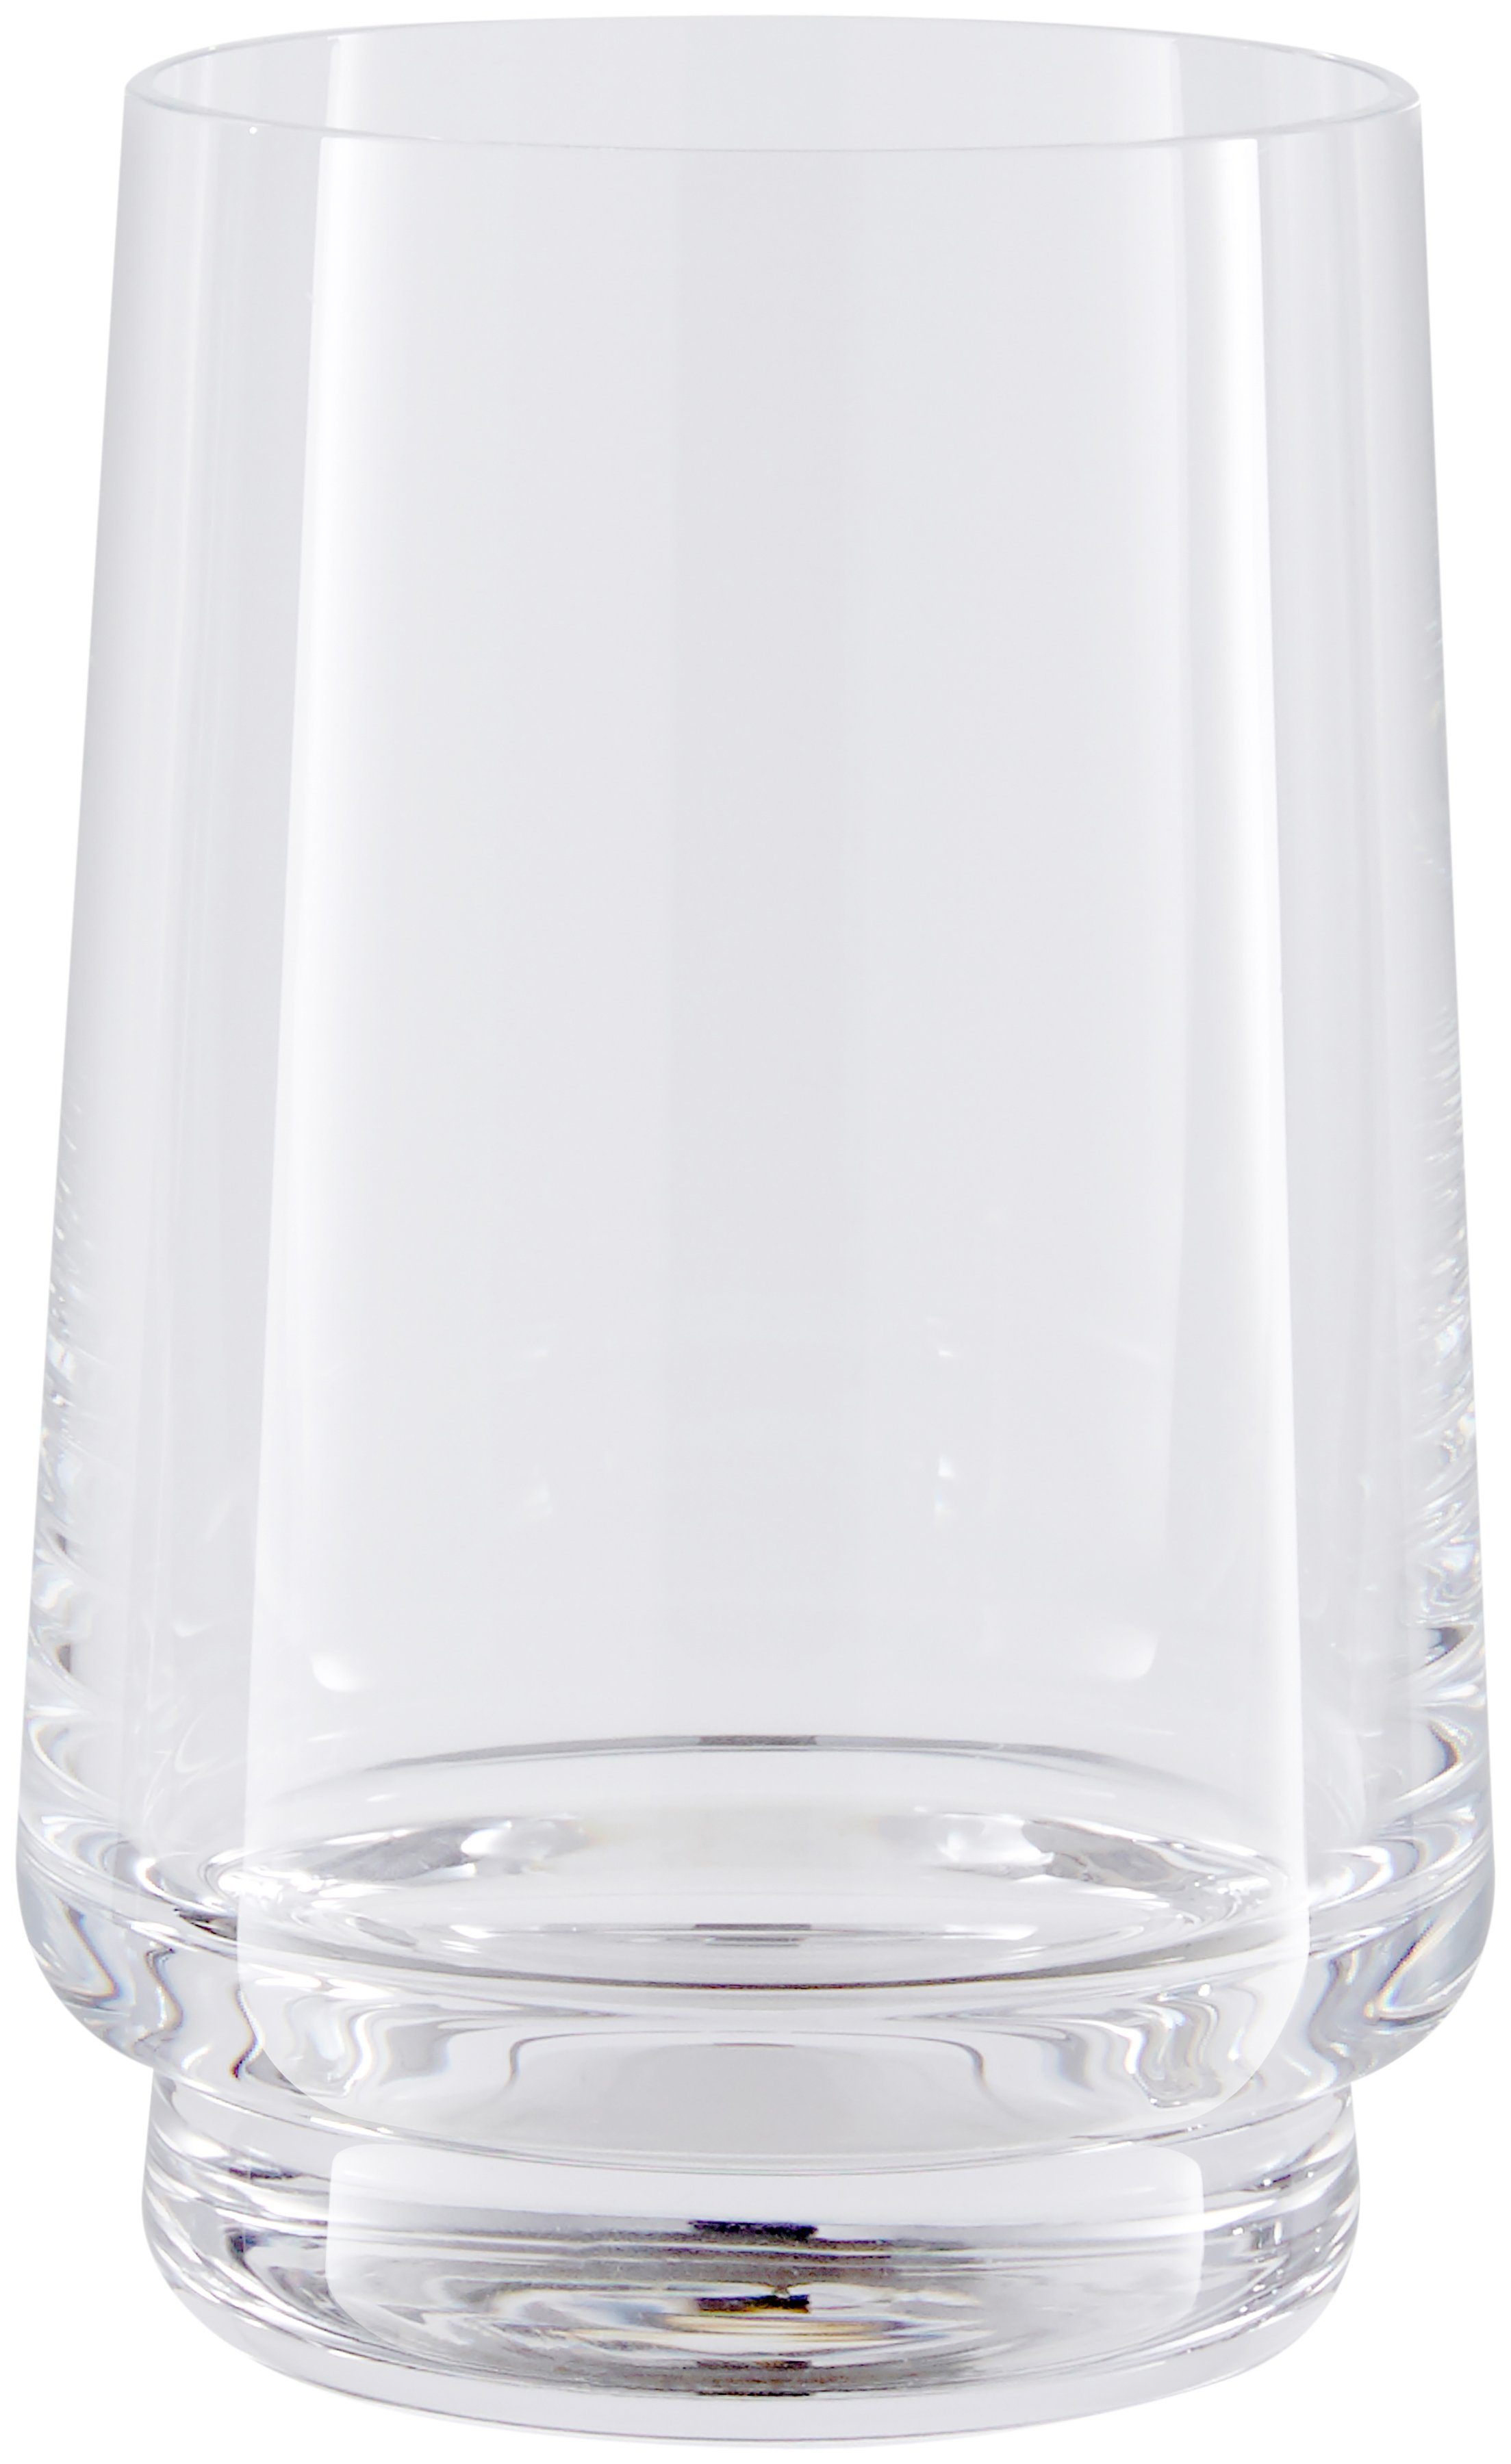 KEUCO Ersatzglas »Edition 11«, Echtkristall-Glas, mundgeblasen, lose